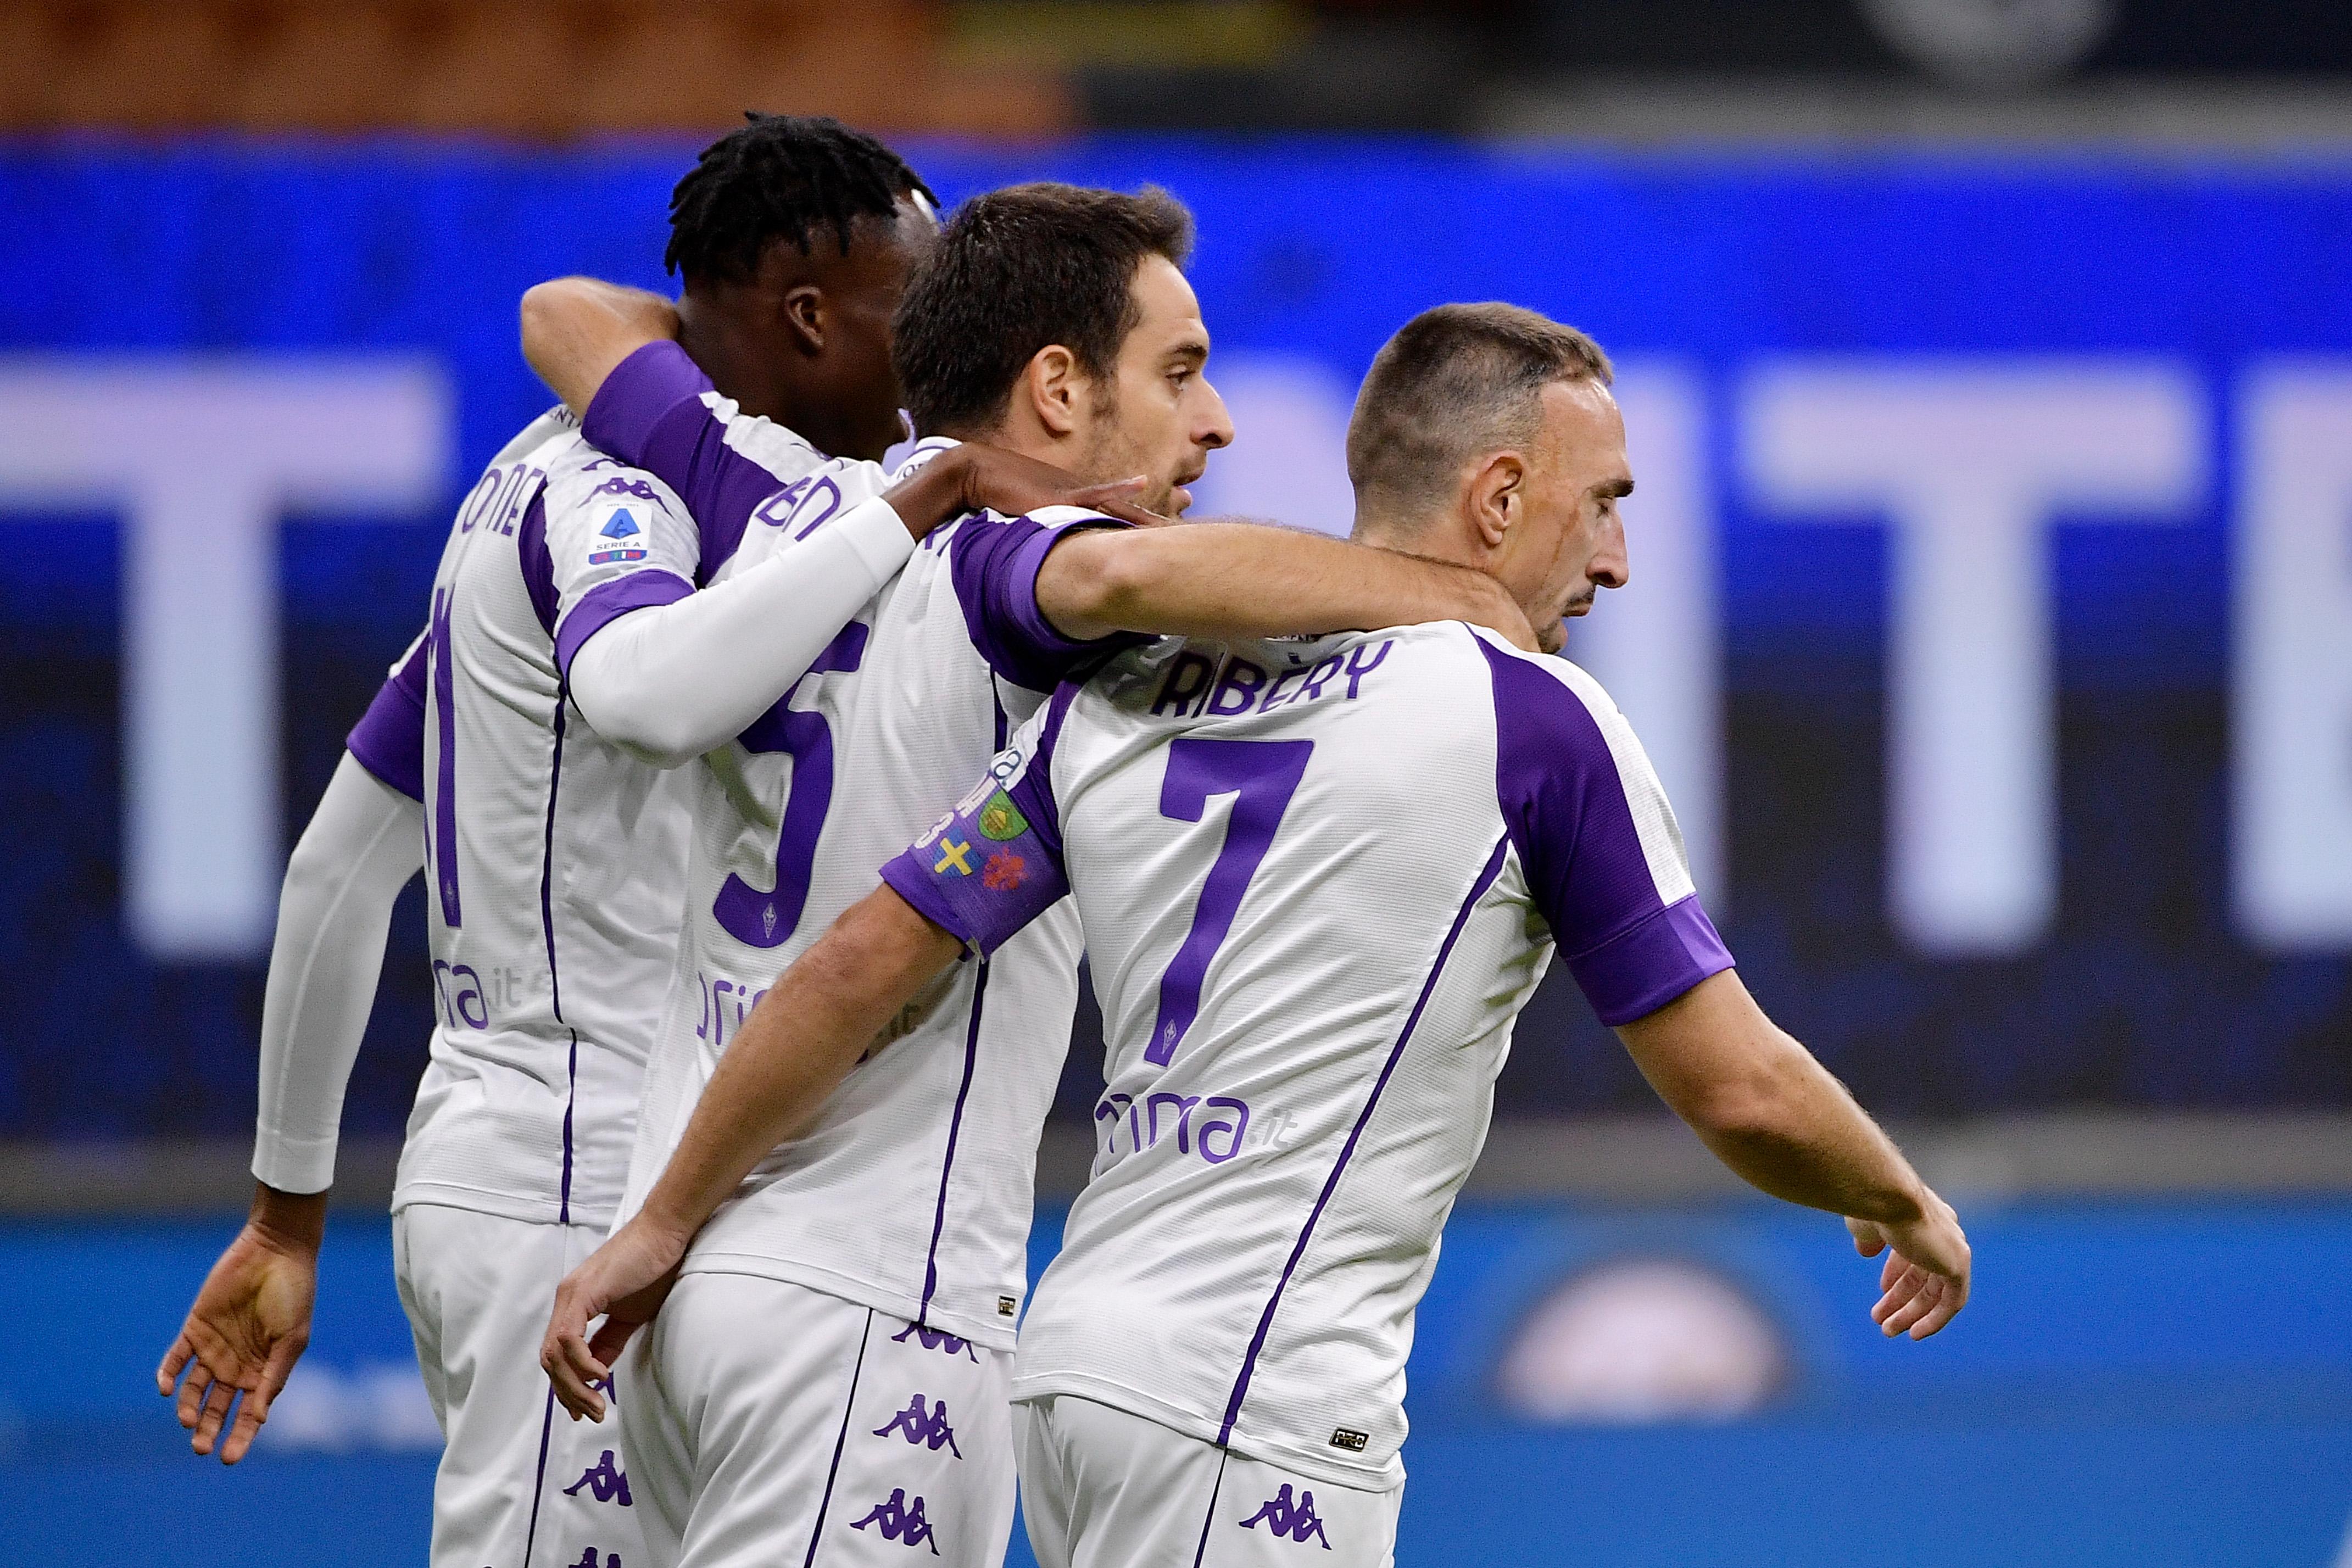 Internazionale v Fiorentina - Italian Serie A